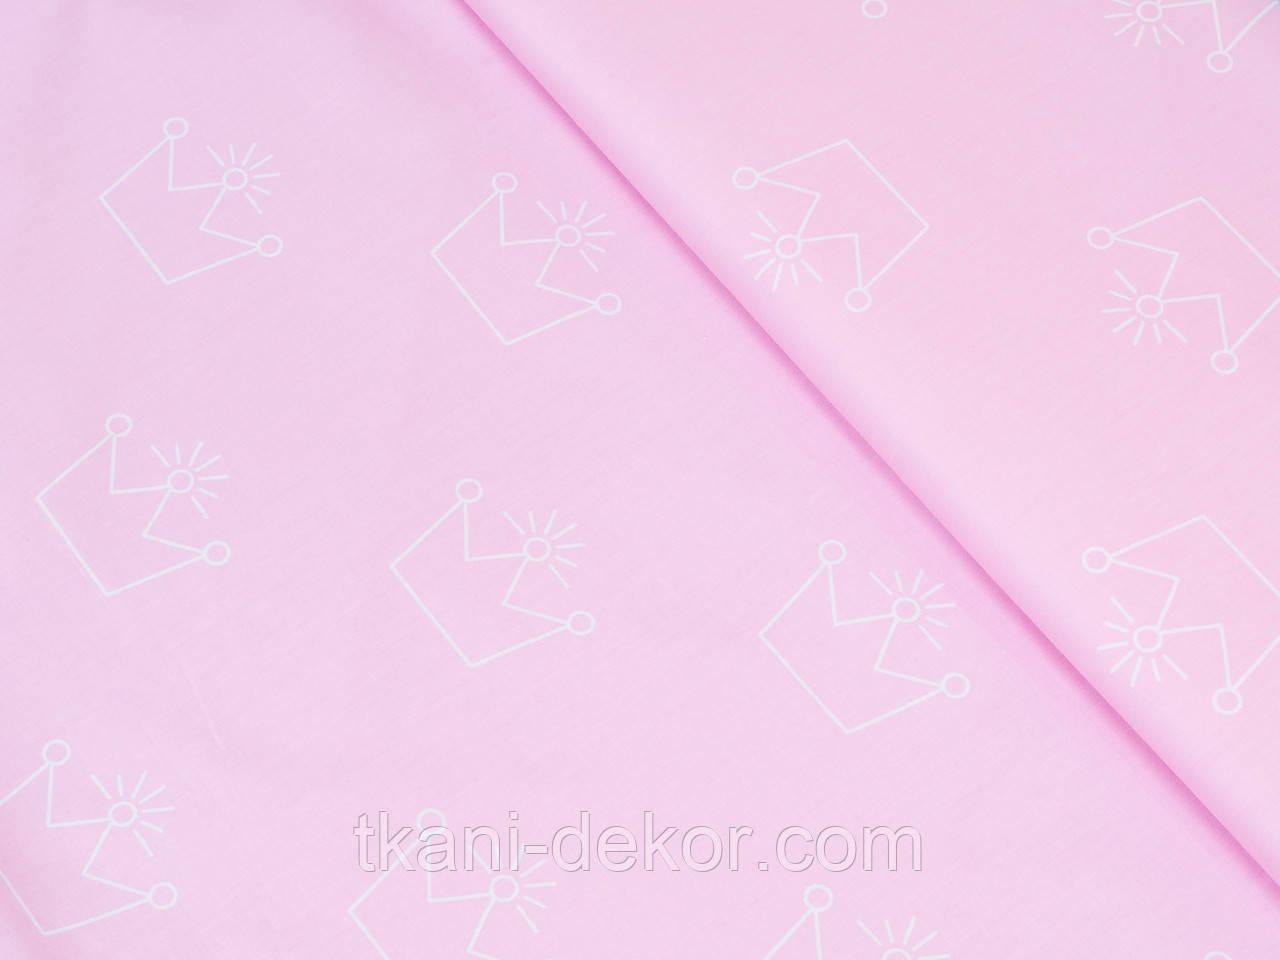 Сатин (хлопковая ткань) на розовом фоне короны